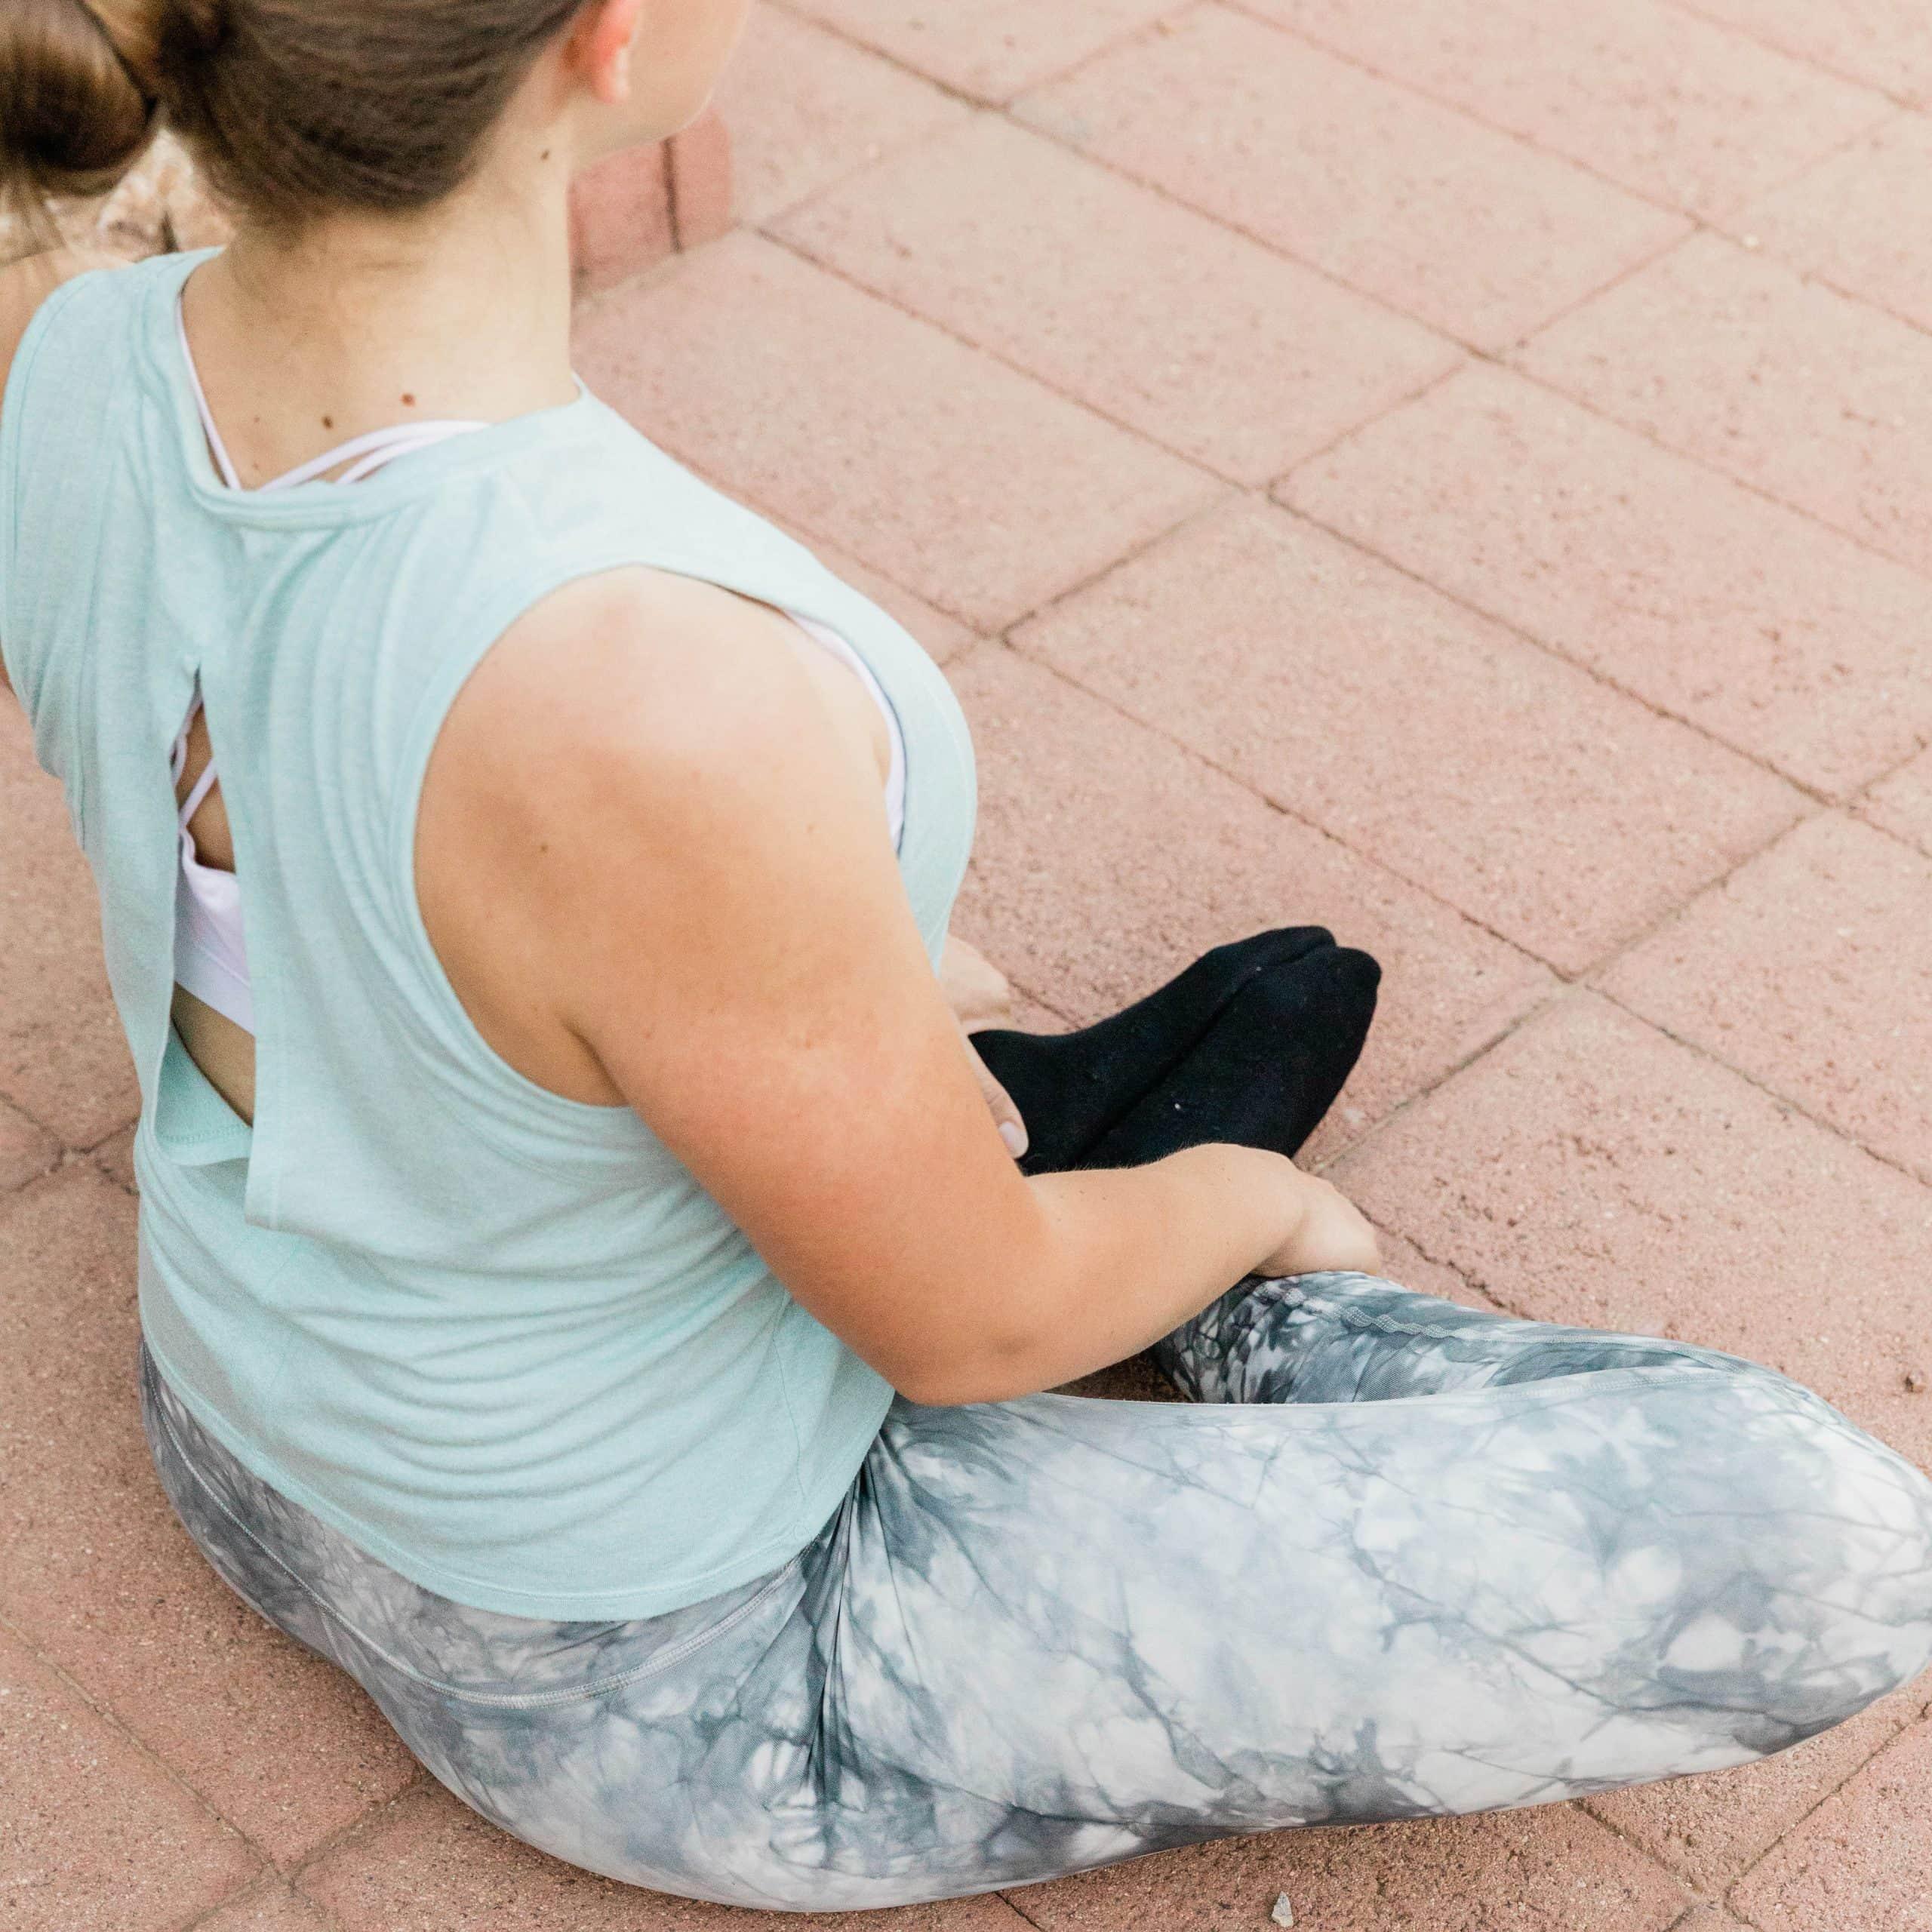 Ten Ways To Be More Body Confident